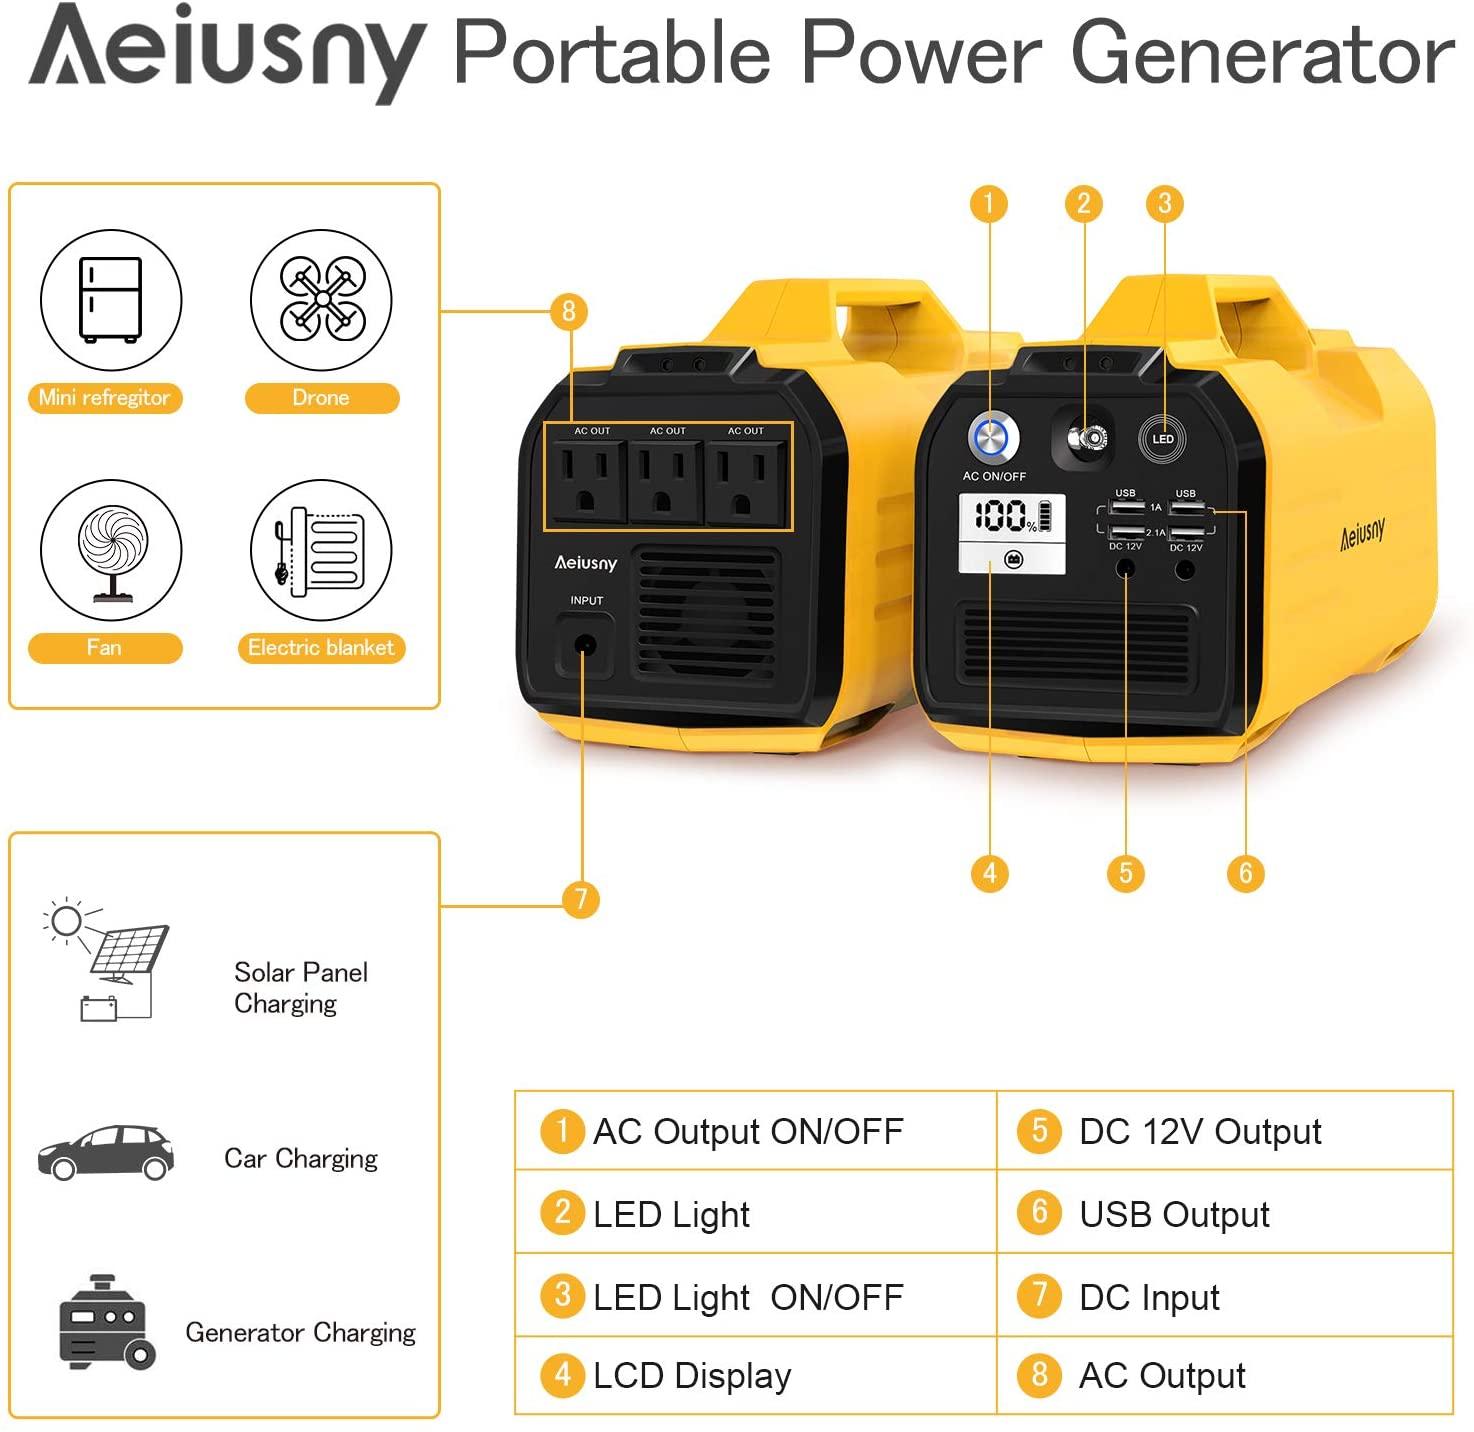 400W Aeiusny Portable Power Station